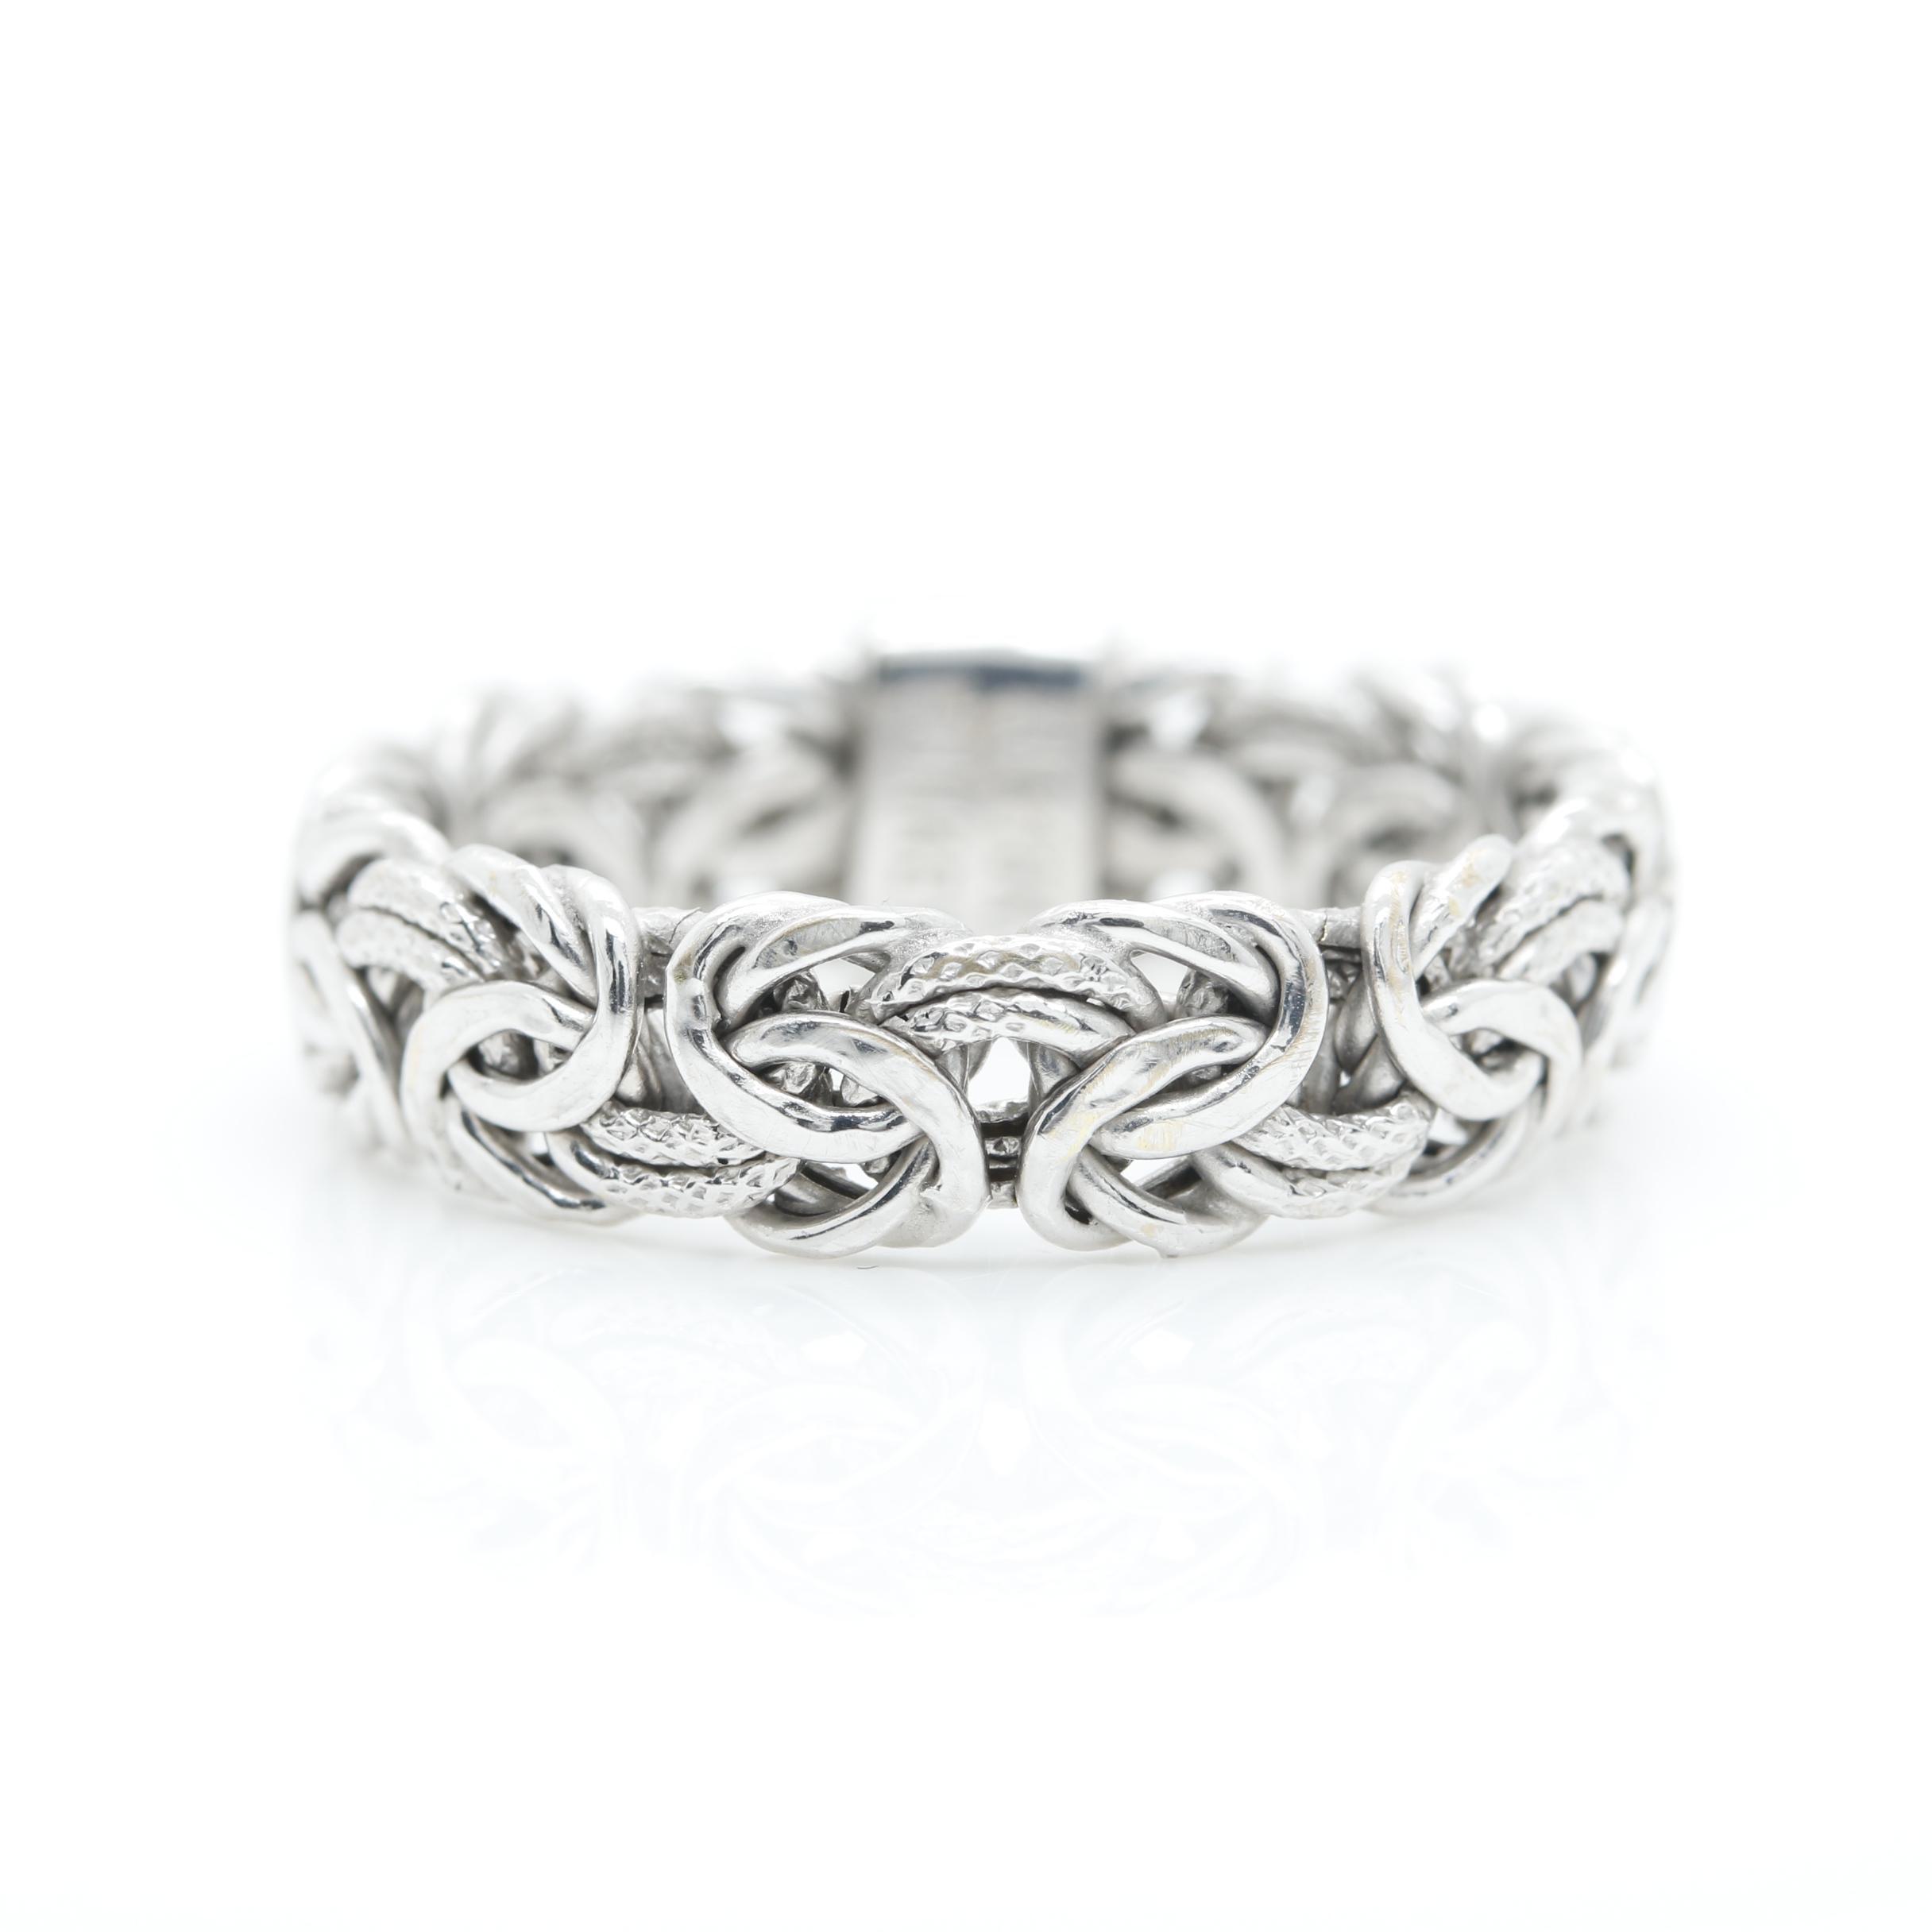 18K White Gold Chain Ring